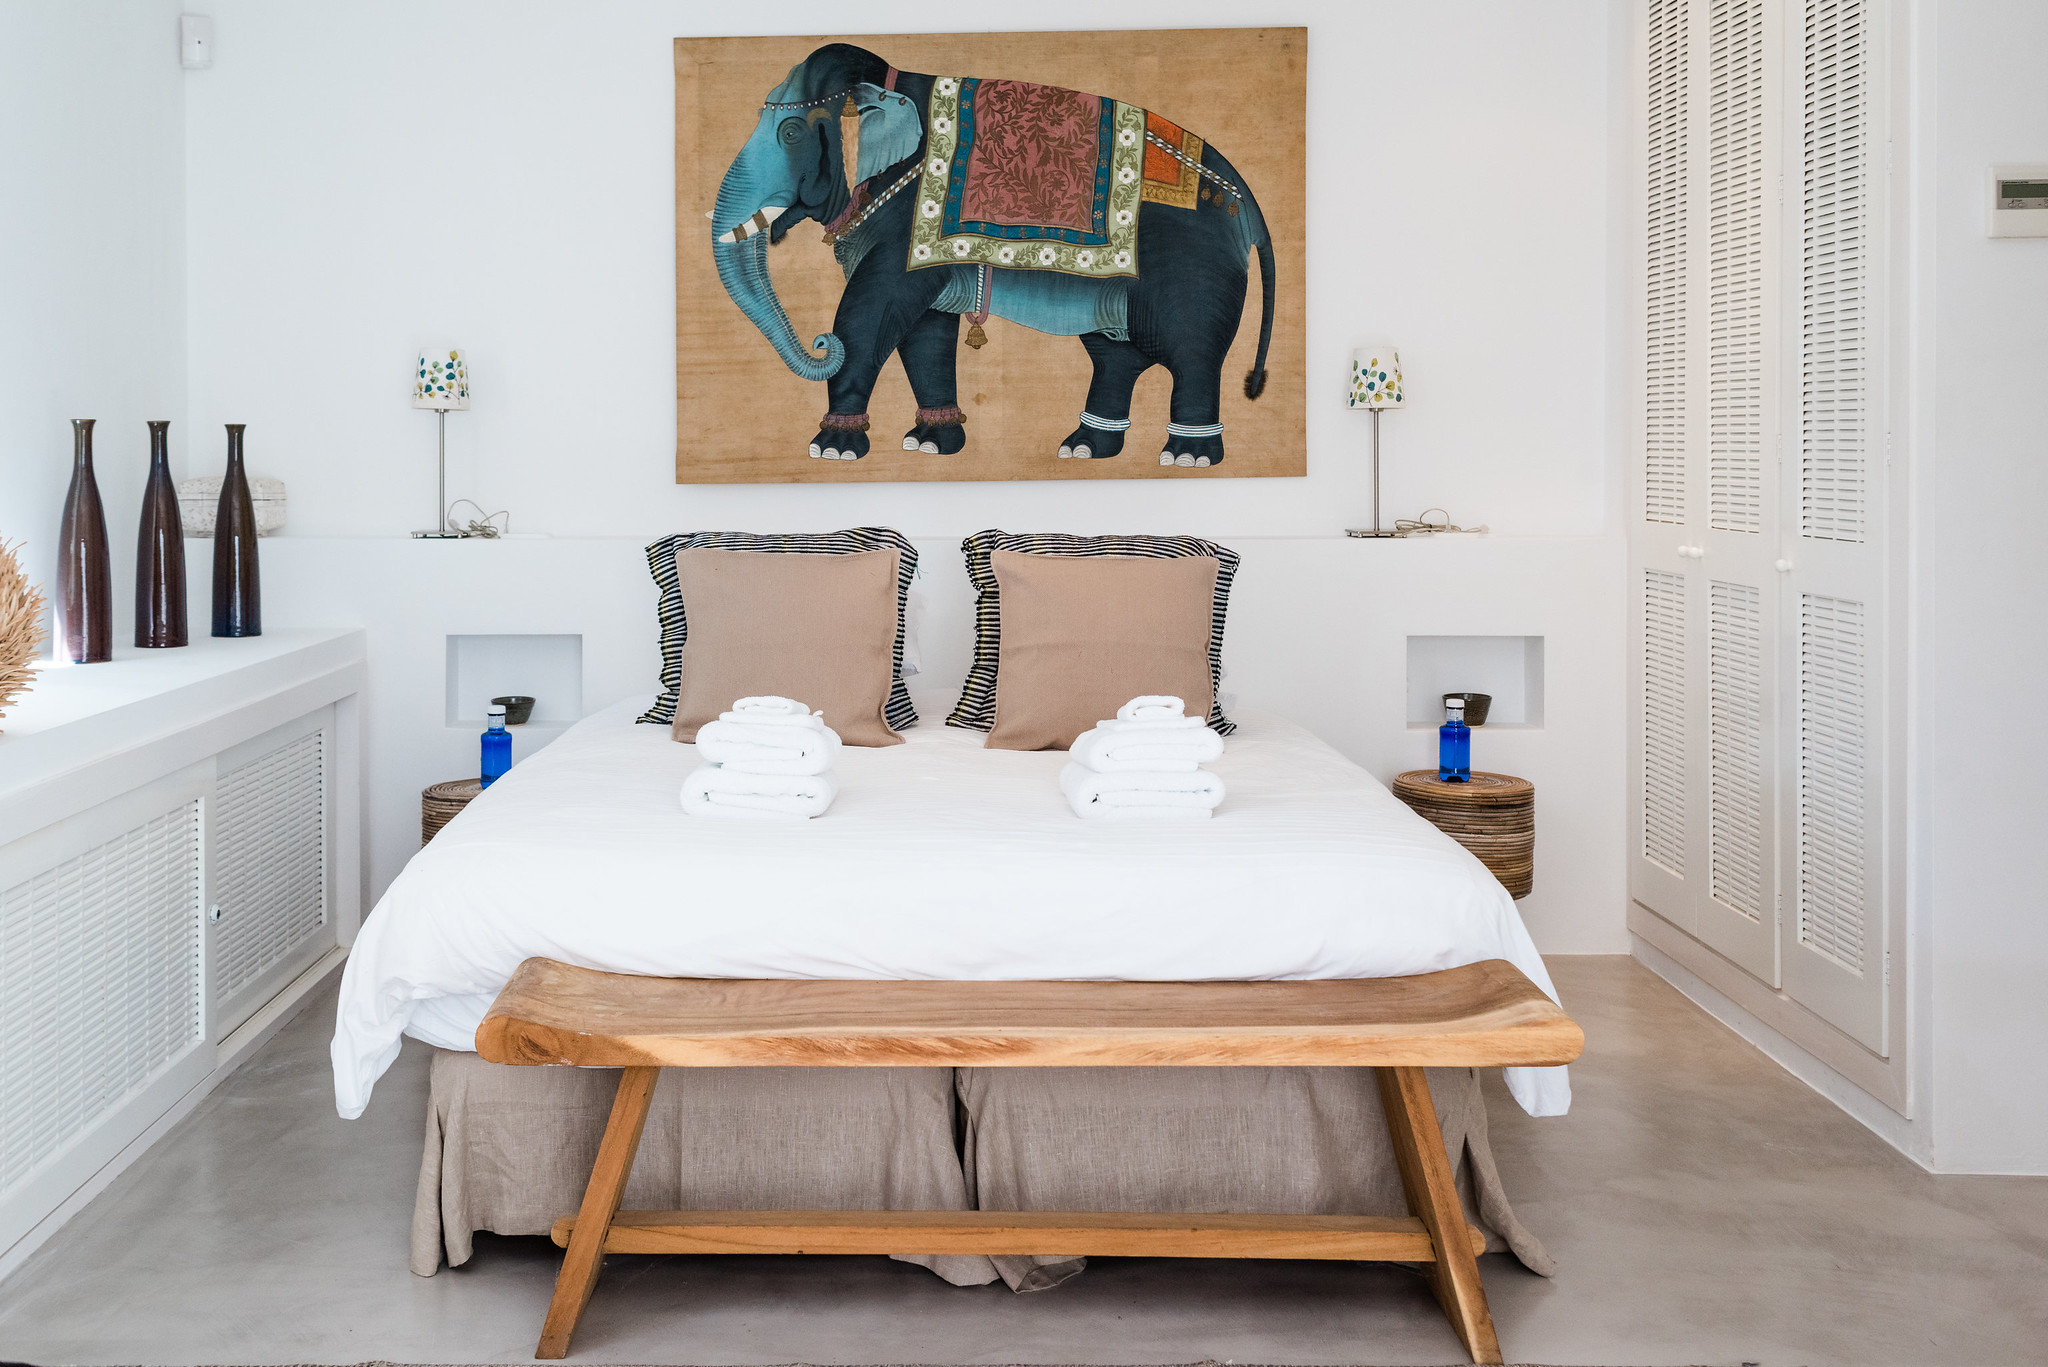 https://www.white-ibiza.com/wp-content/uploads/2020/06/white-ibiza-villas-casa-nyah-interior-bedroom13.jpg